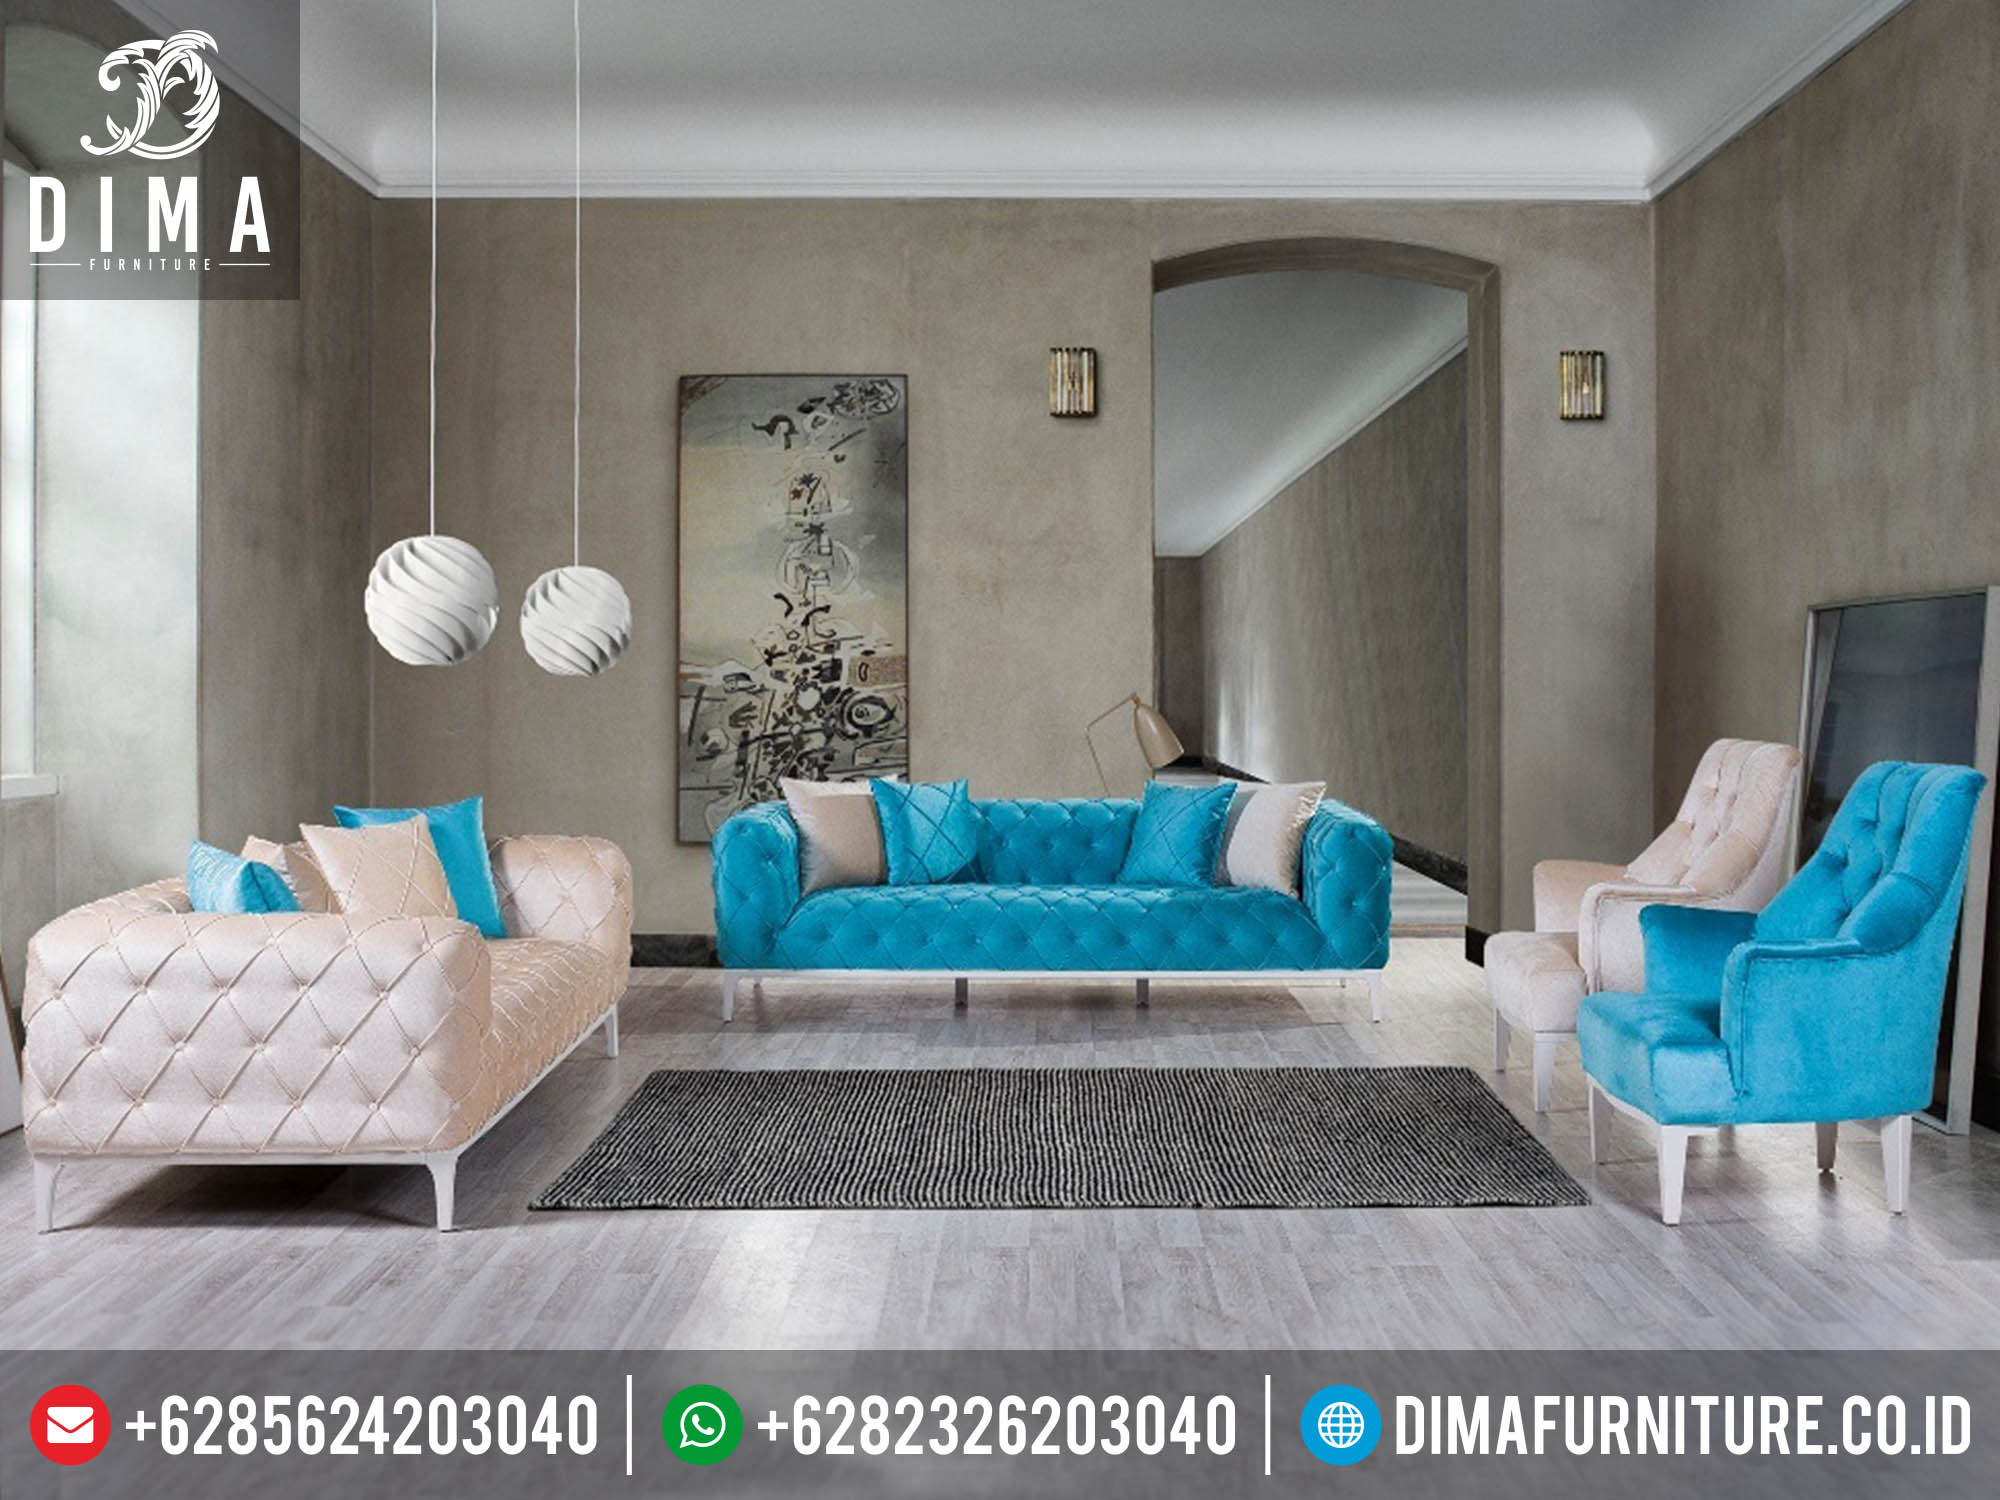 Set Kursi Sofa Tamu Minimalis Modern Terbaru Mewah DF-0166